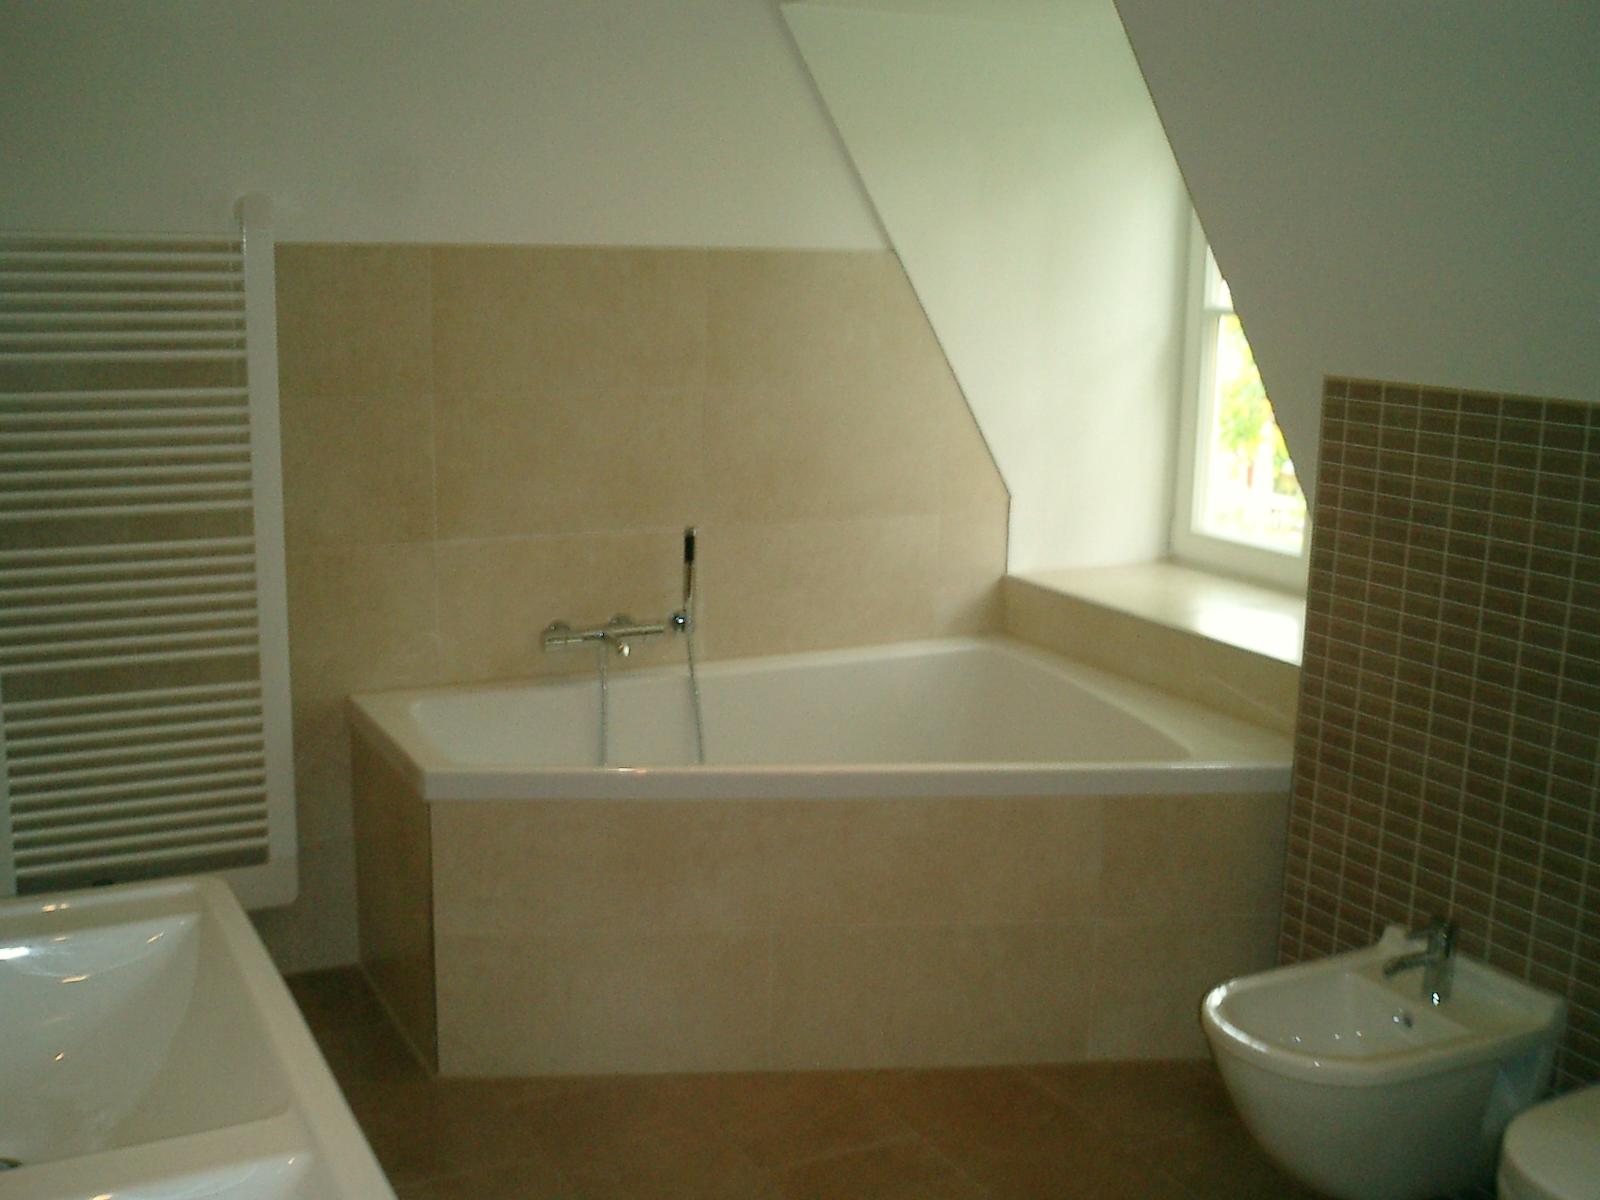 fliesenlegermeister erik gerdel kreis stromarn. Black Bedroom Furniture Sets. Home Design Ideas